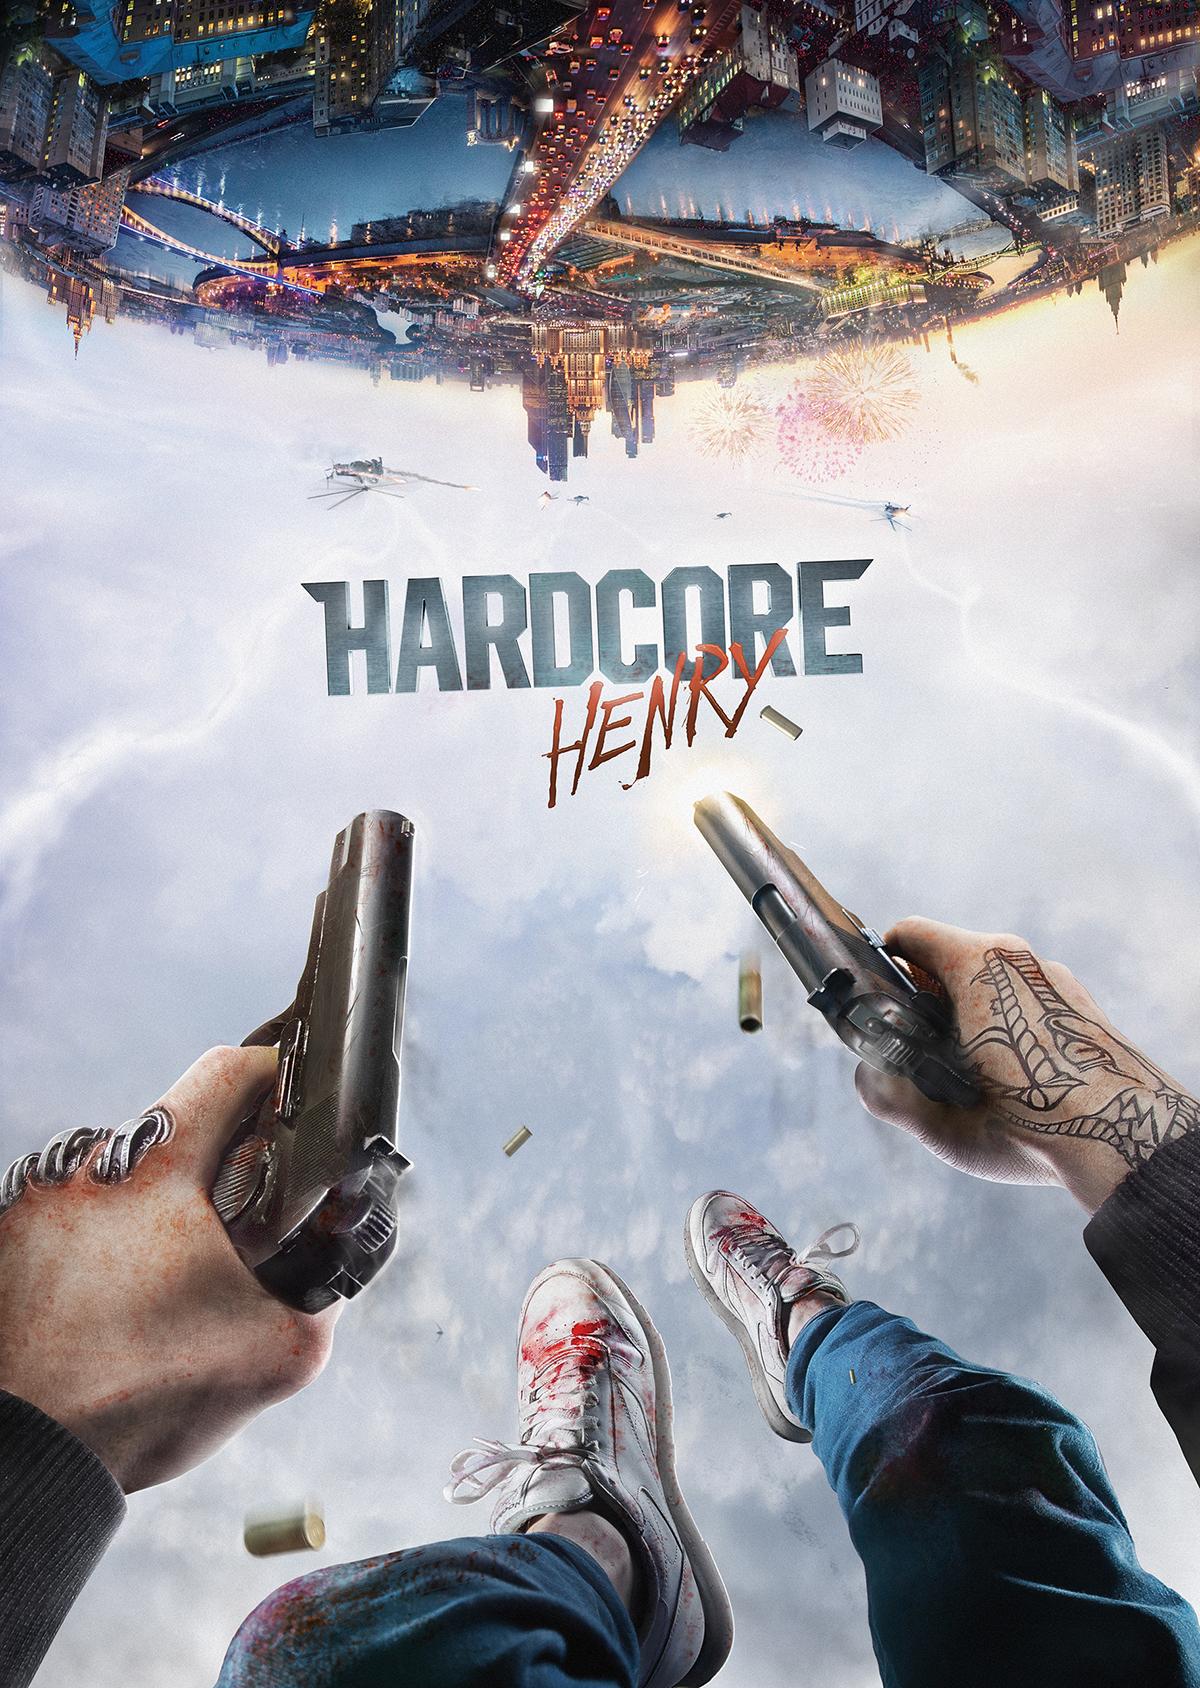 Hardcore.Henry